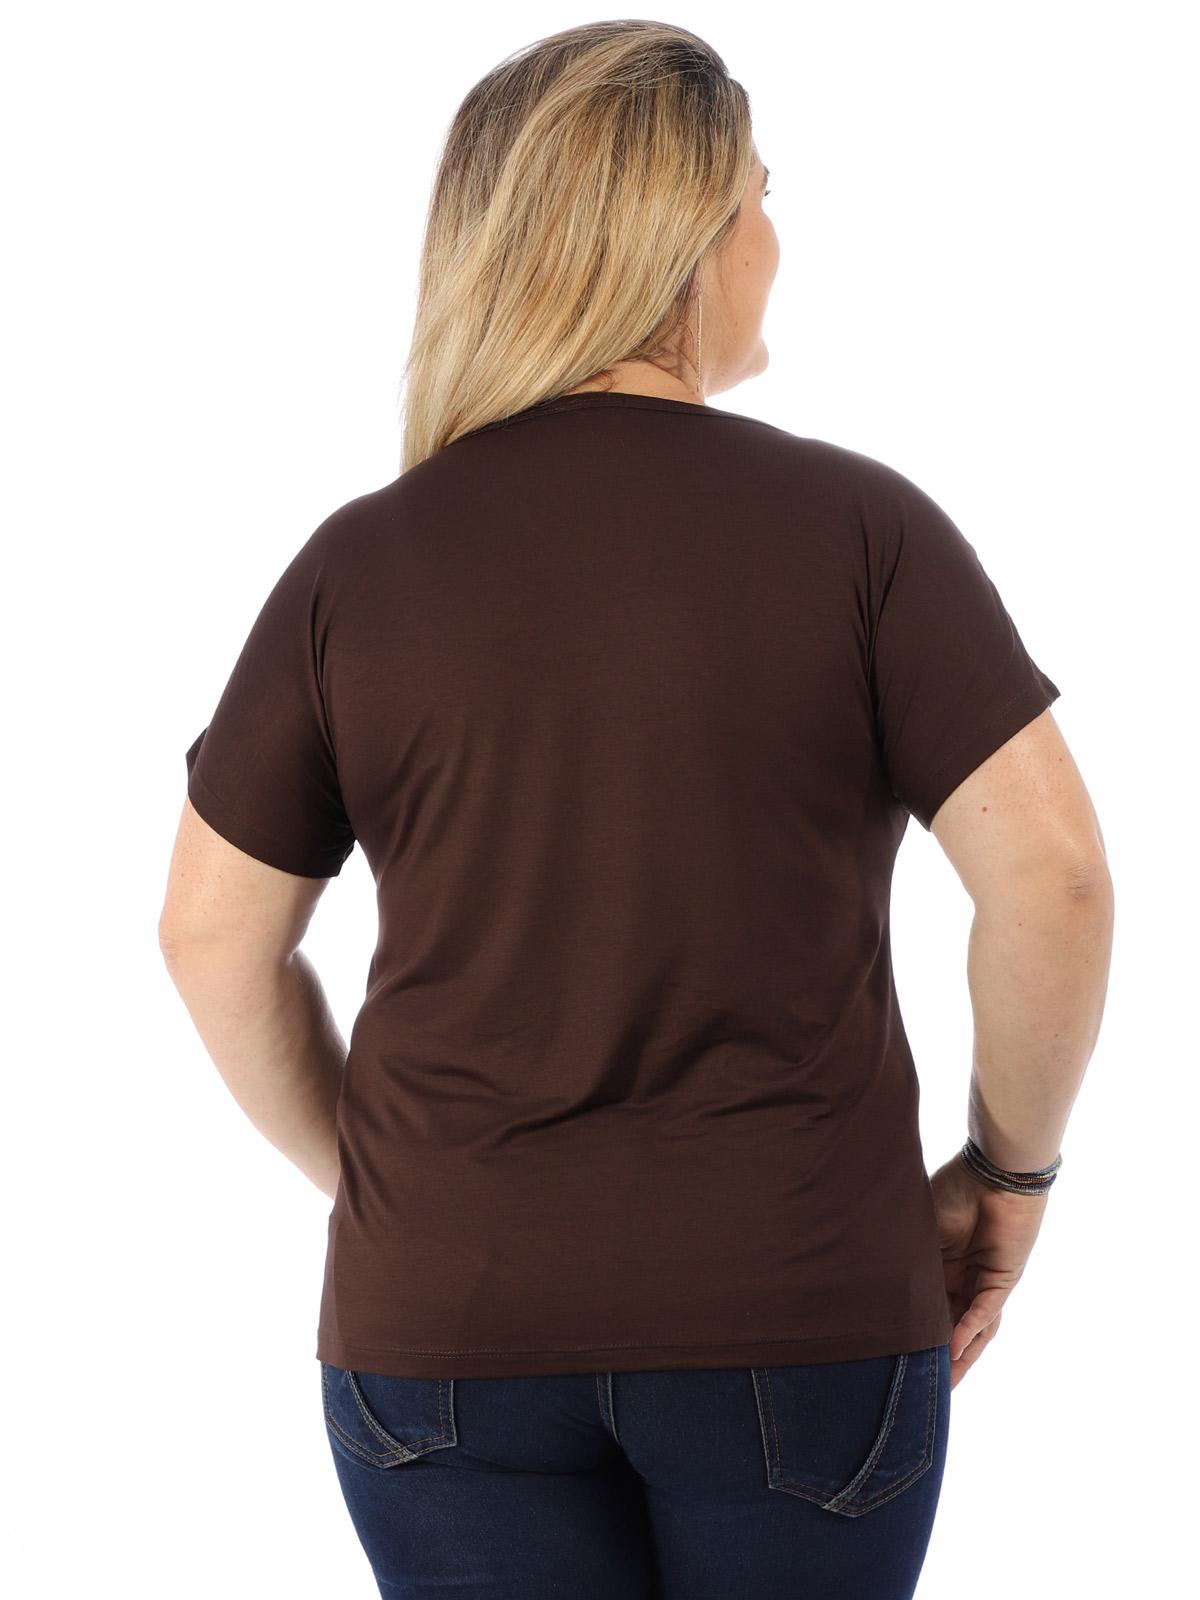 Blusa Plus Size Feminina Decote Canoa Botões Ombro Marrom